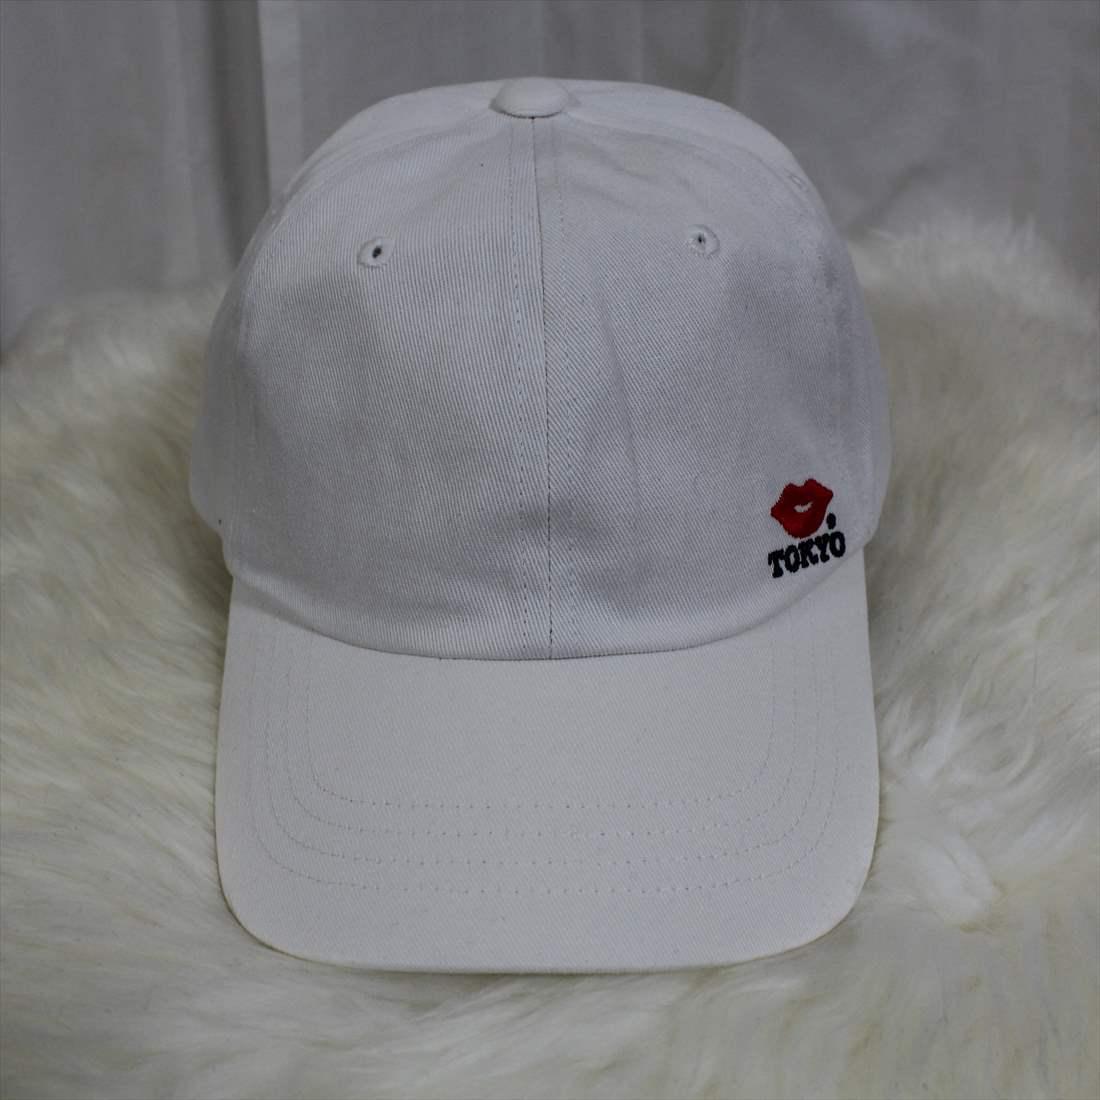 KISS TOKYO LIP LOGO LOW CAP サイドロゴ刺繍 ホワイト キャップ 新品 白 帽子_画像1